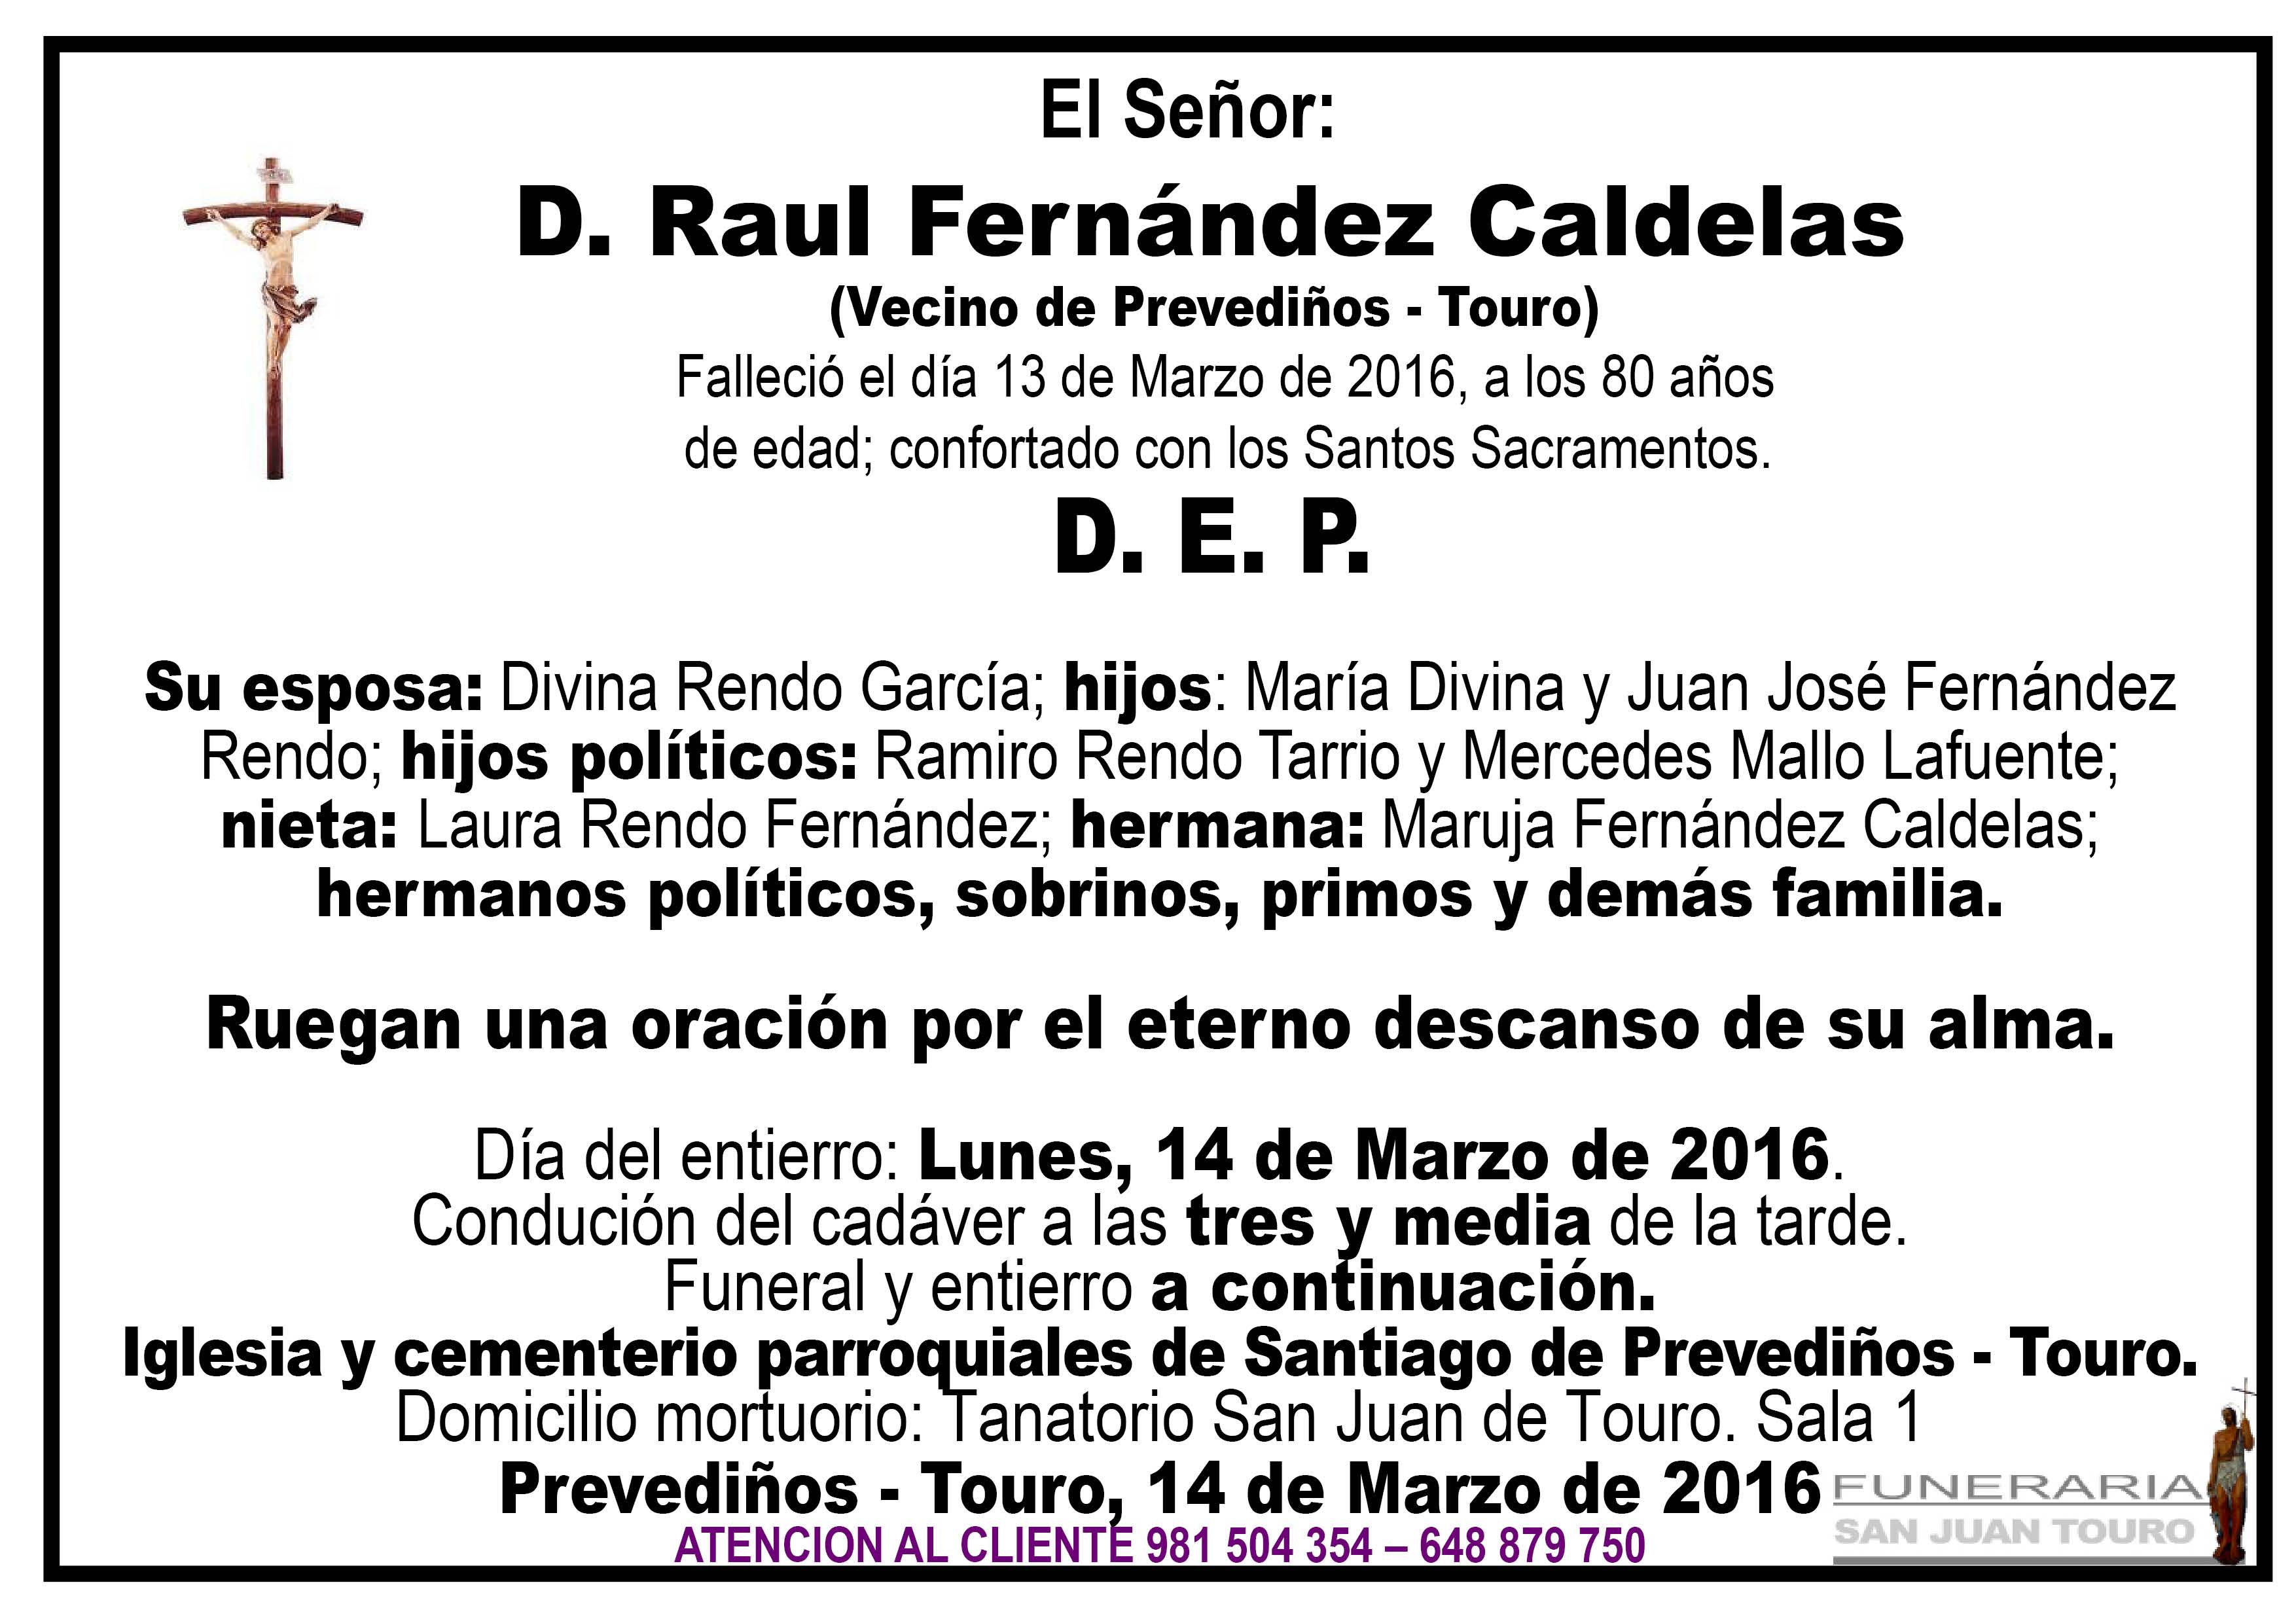 Esquela de SEPELIO D. RAUL FERNÁNDEZ CALDELAS